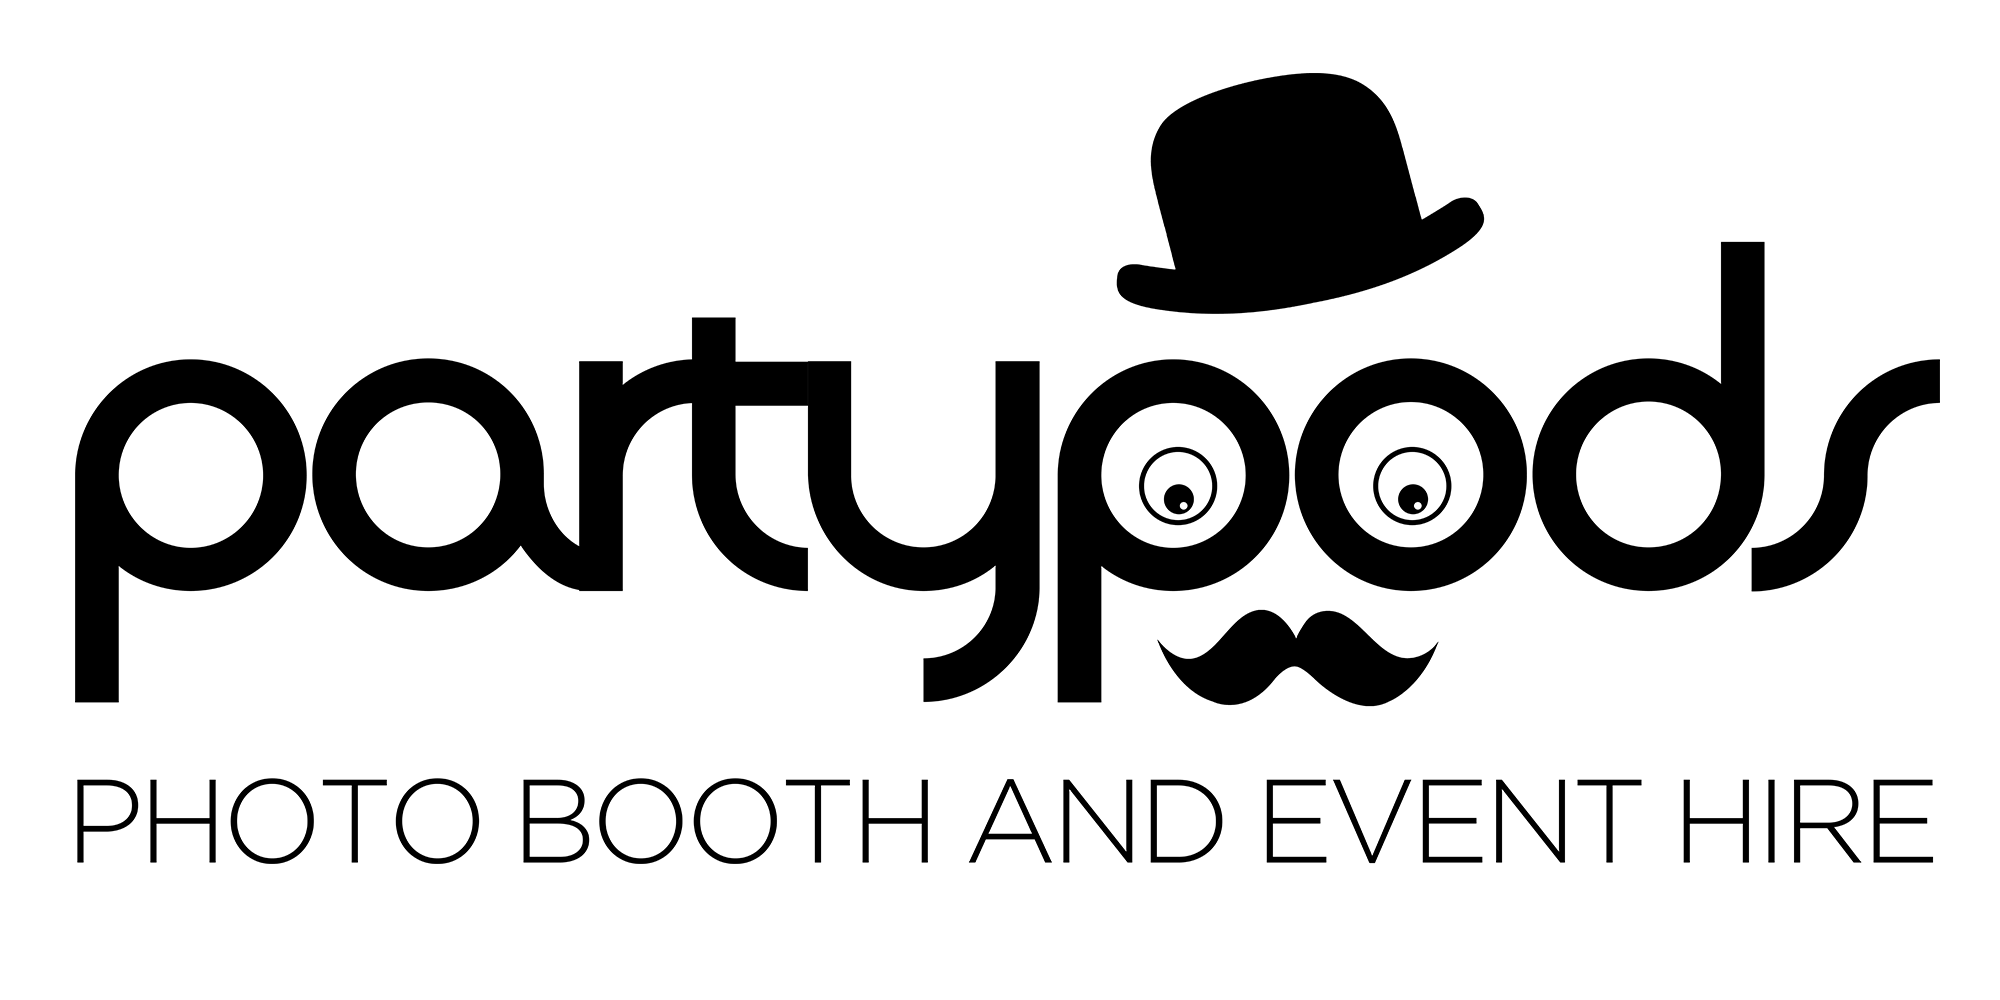 partypods_logo_header_b